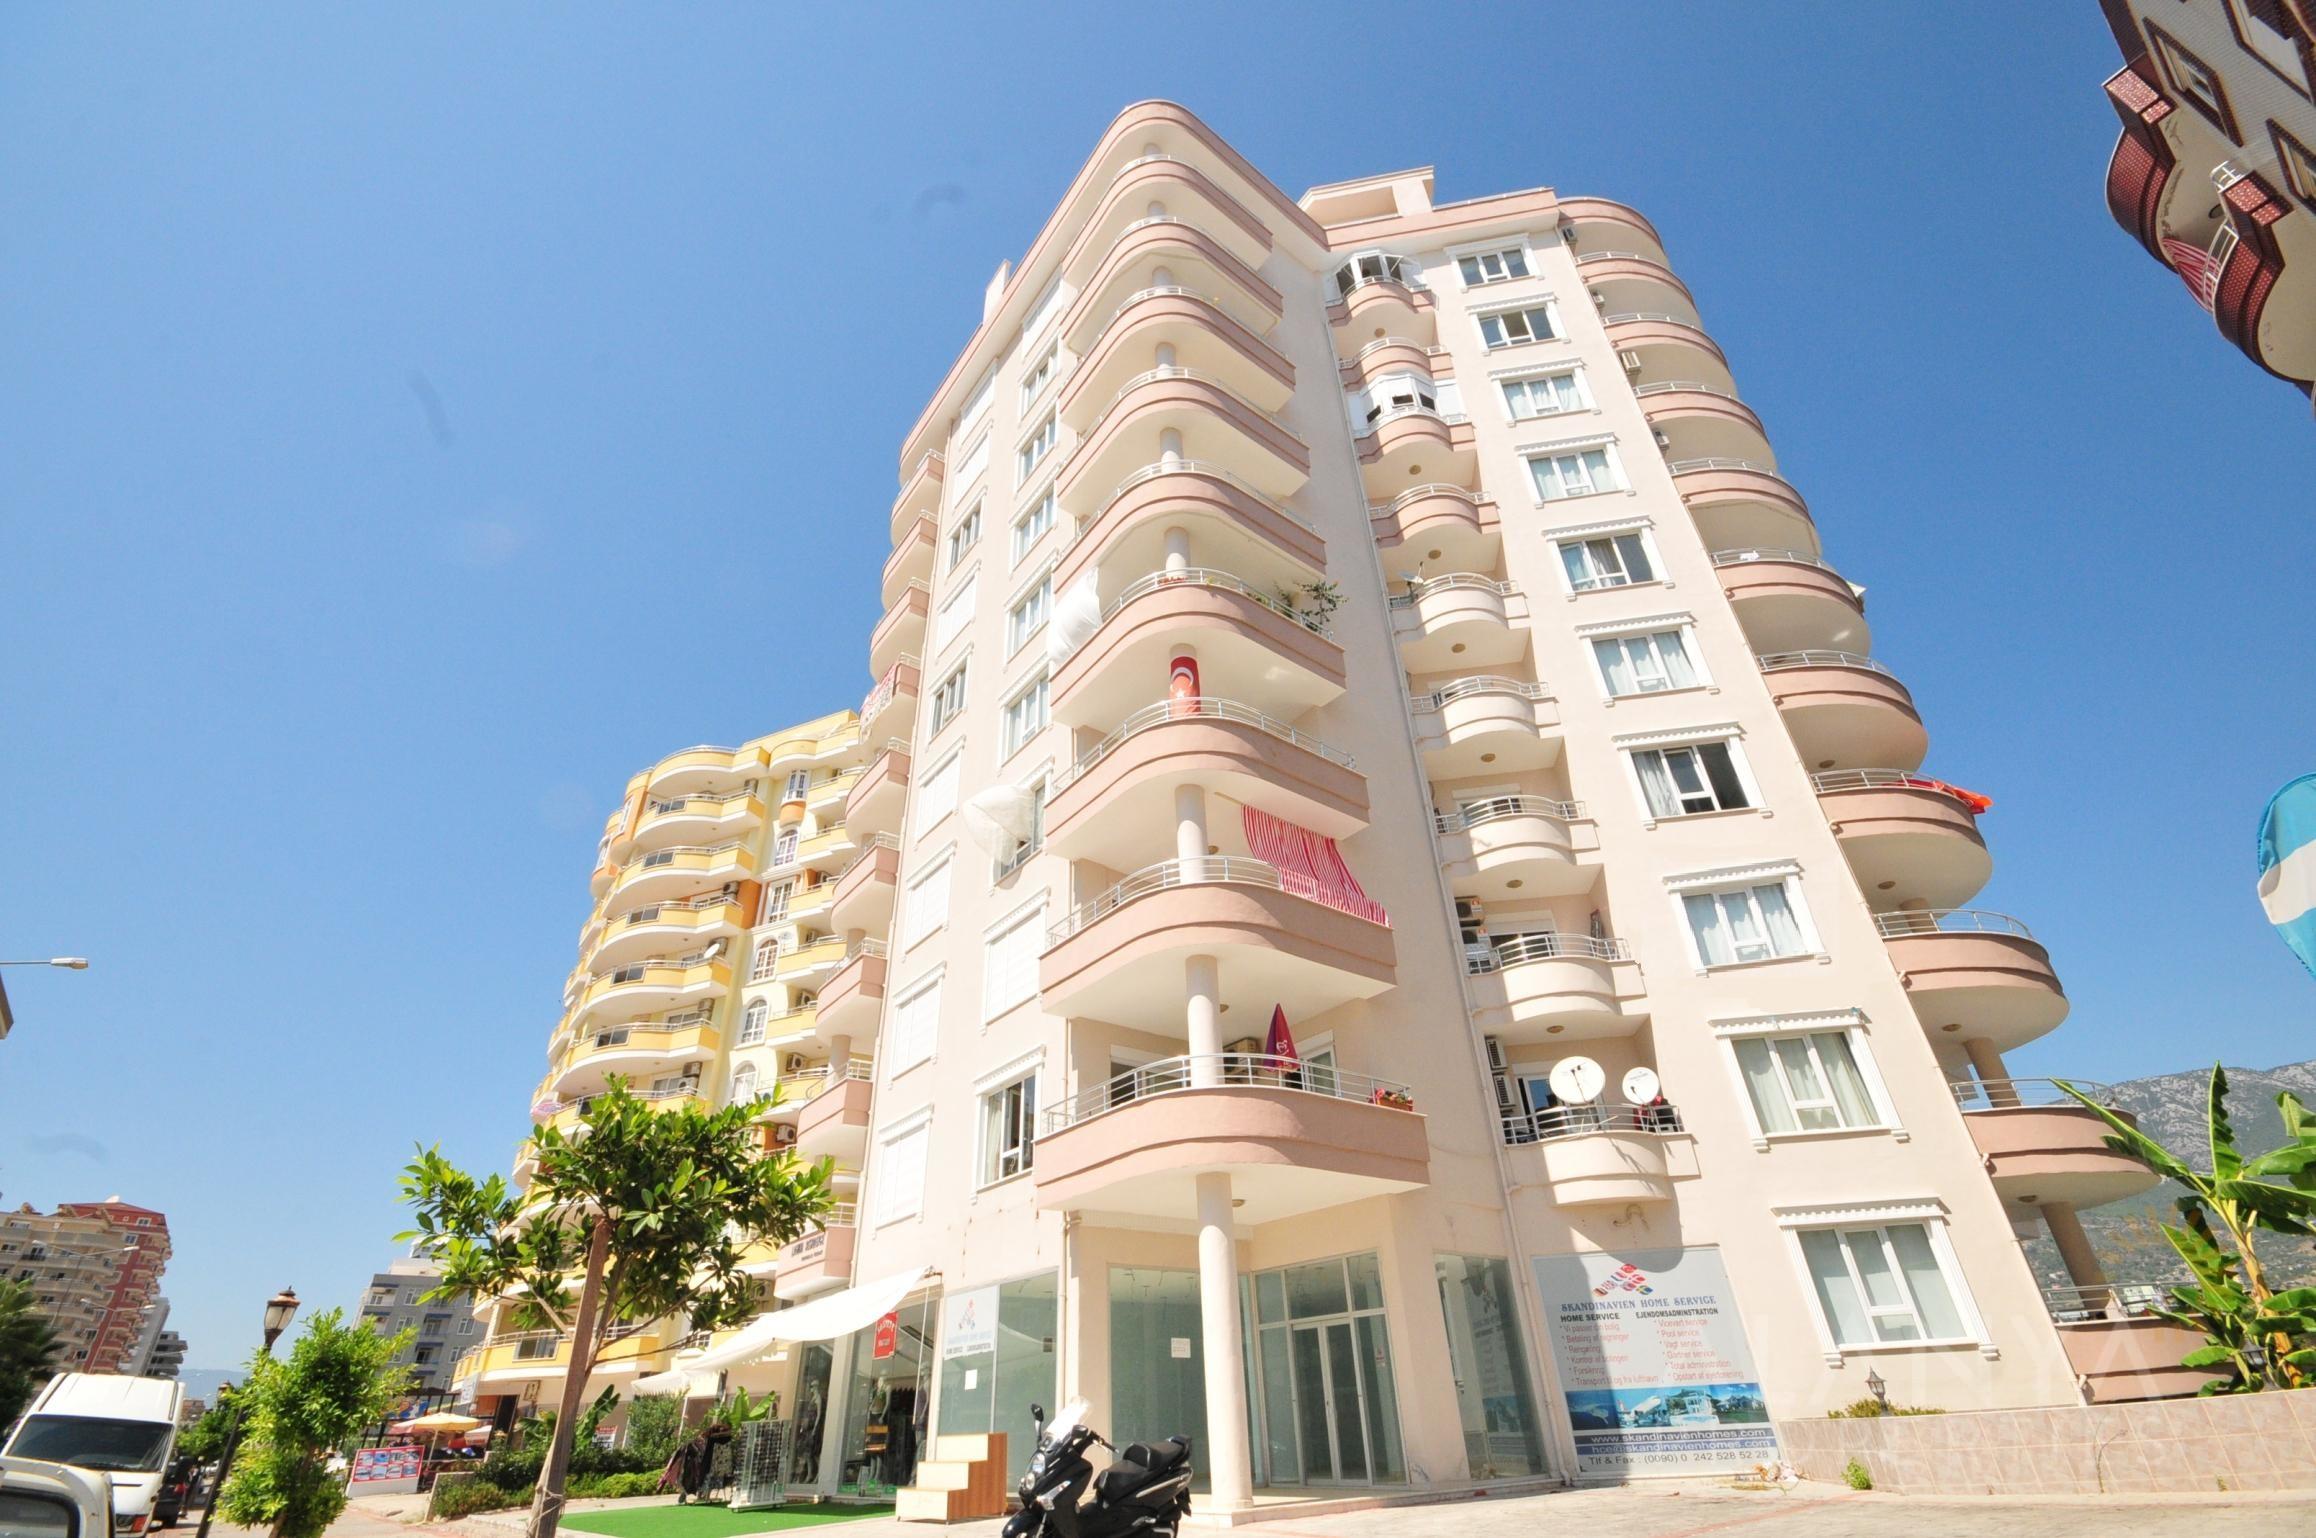 Mooi gemeubeld appartement 2 slaapkamers te koop in Mahmutlar, Alanya